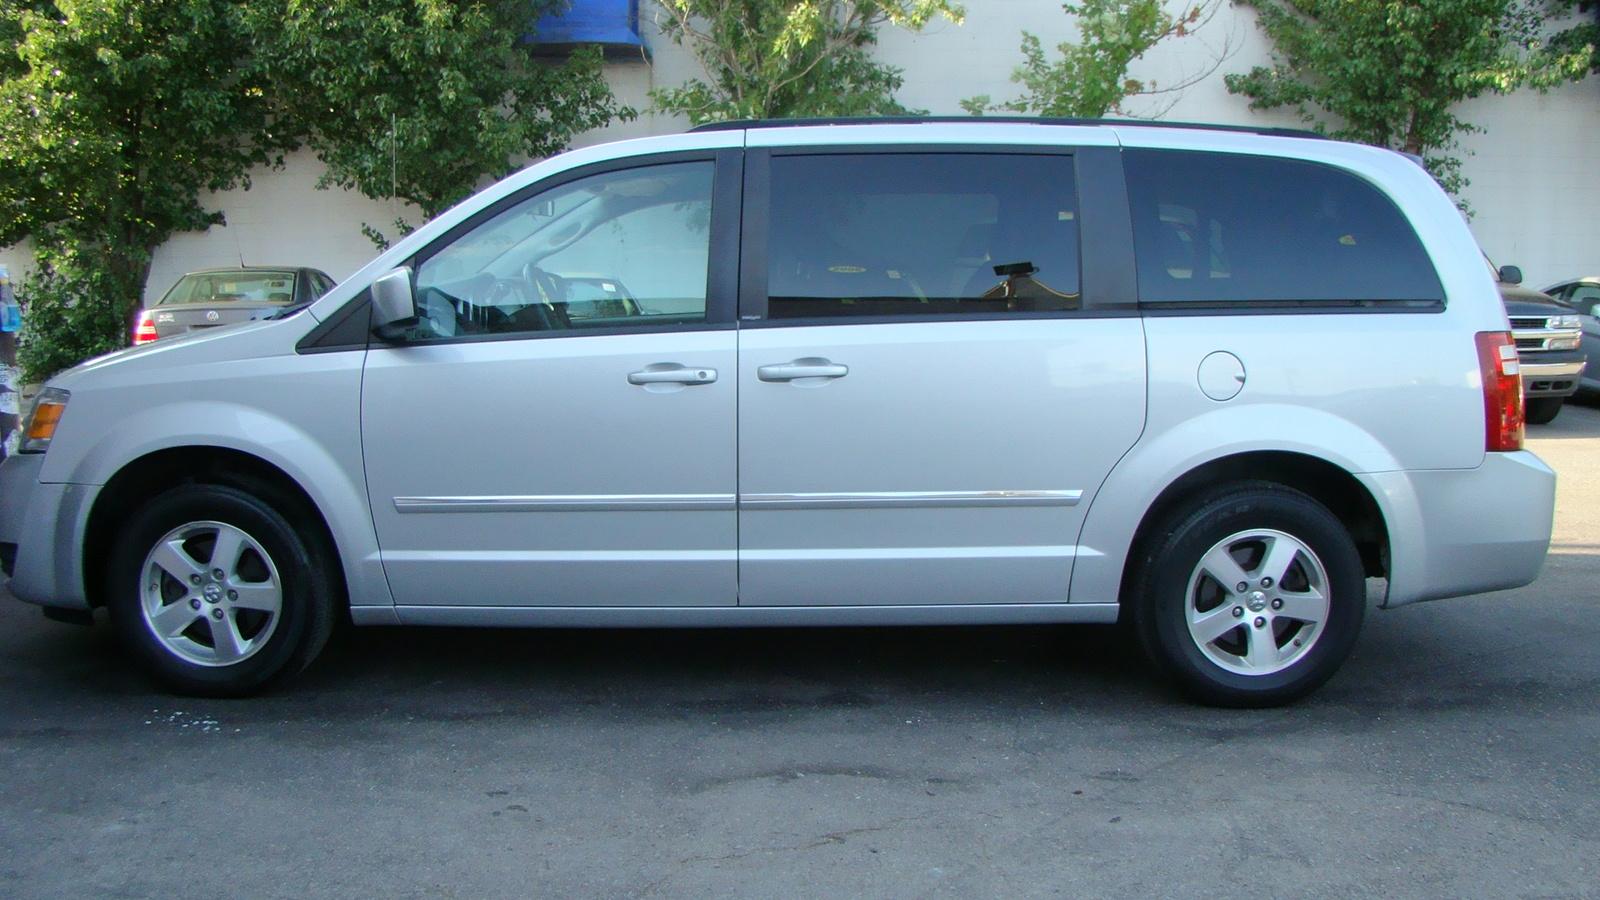 Dodge Grand Caravan Fuse Box Diagram 276x300 2005 Dodge Grand Caravan